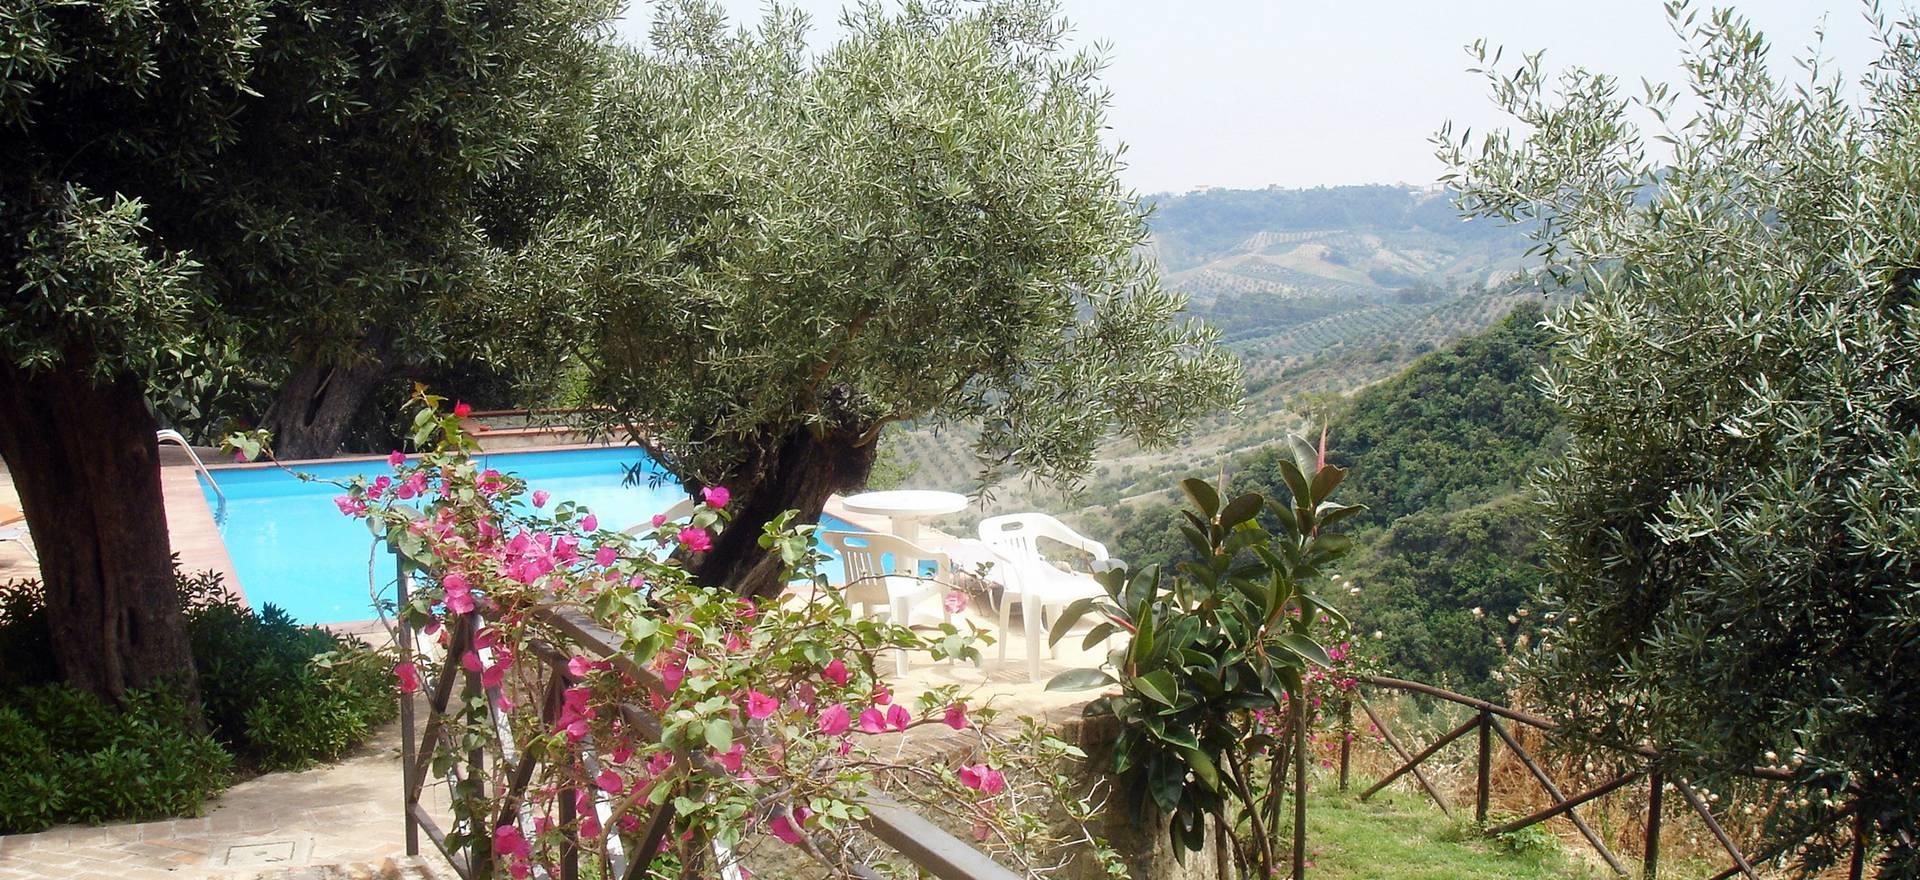 Agriturismo Calabria Agriturismo in Calabria: cultura, spiaggia e cucina